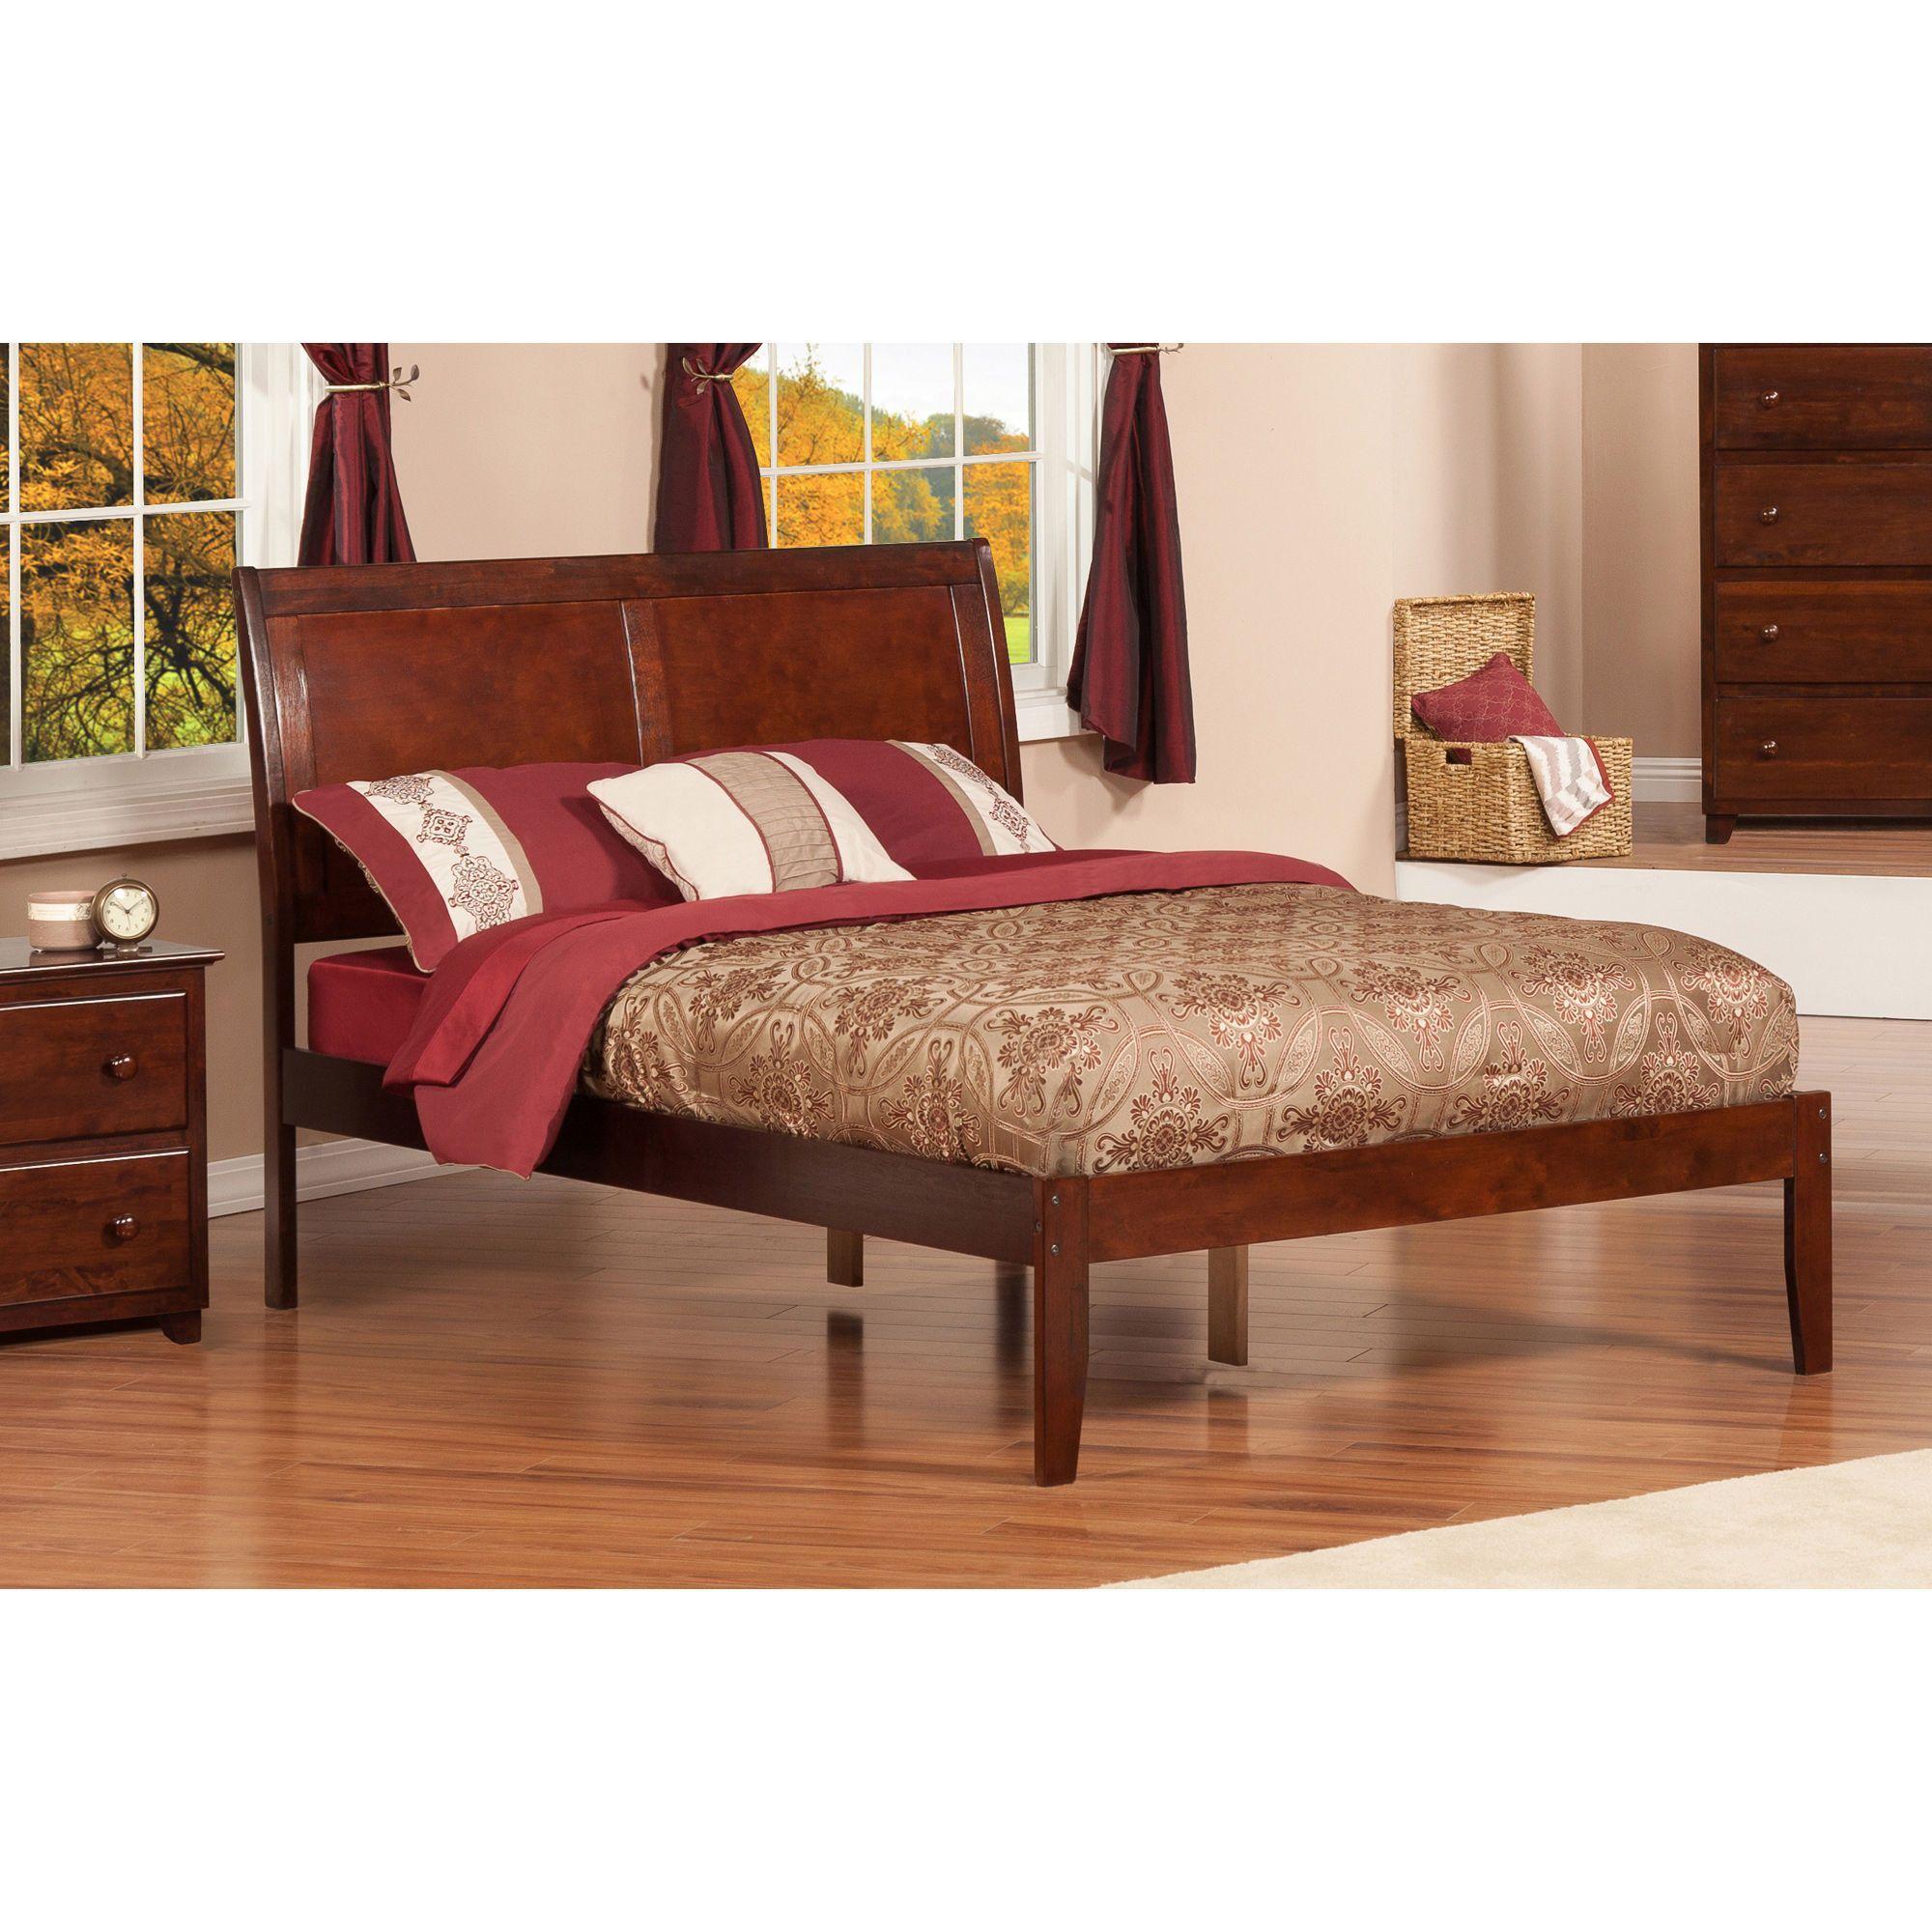 Atlantic Furniture Portland Walnut (Brown) Open Foot Full Size Platform Bed  (Size